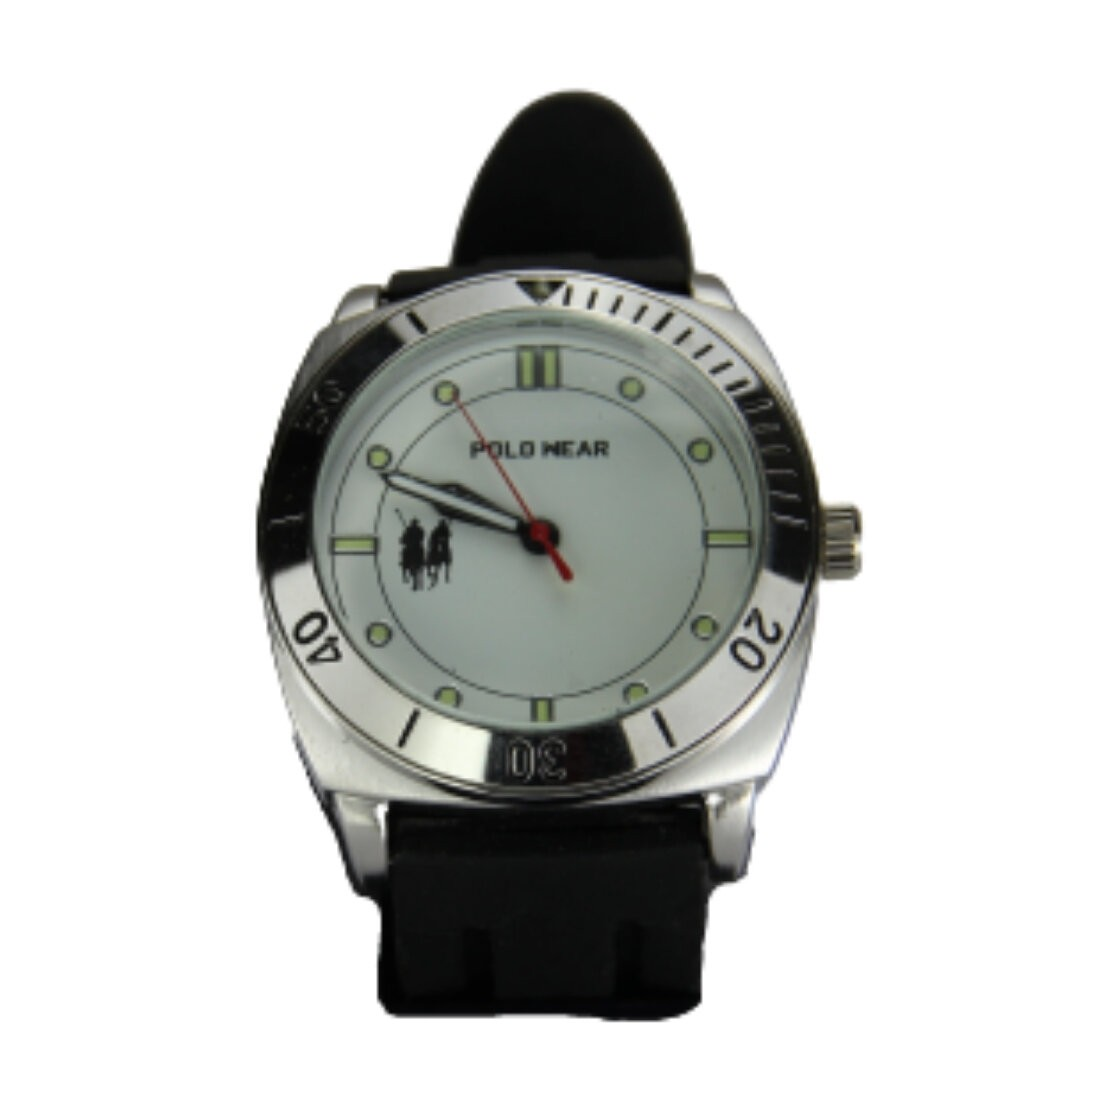 Relógio Khatto Wear Masculino